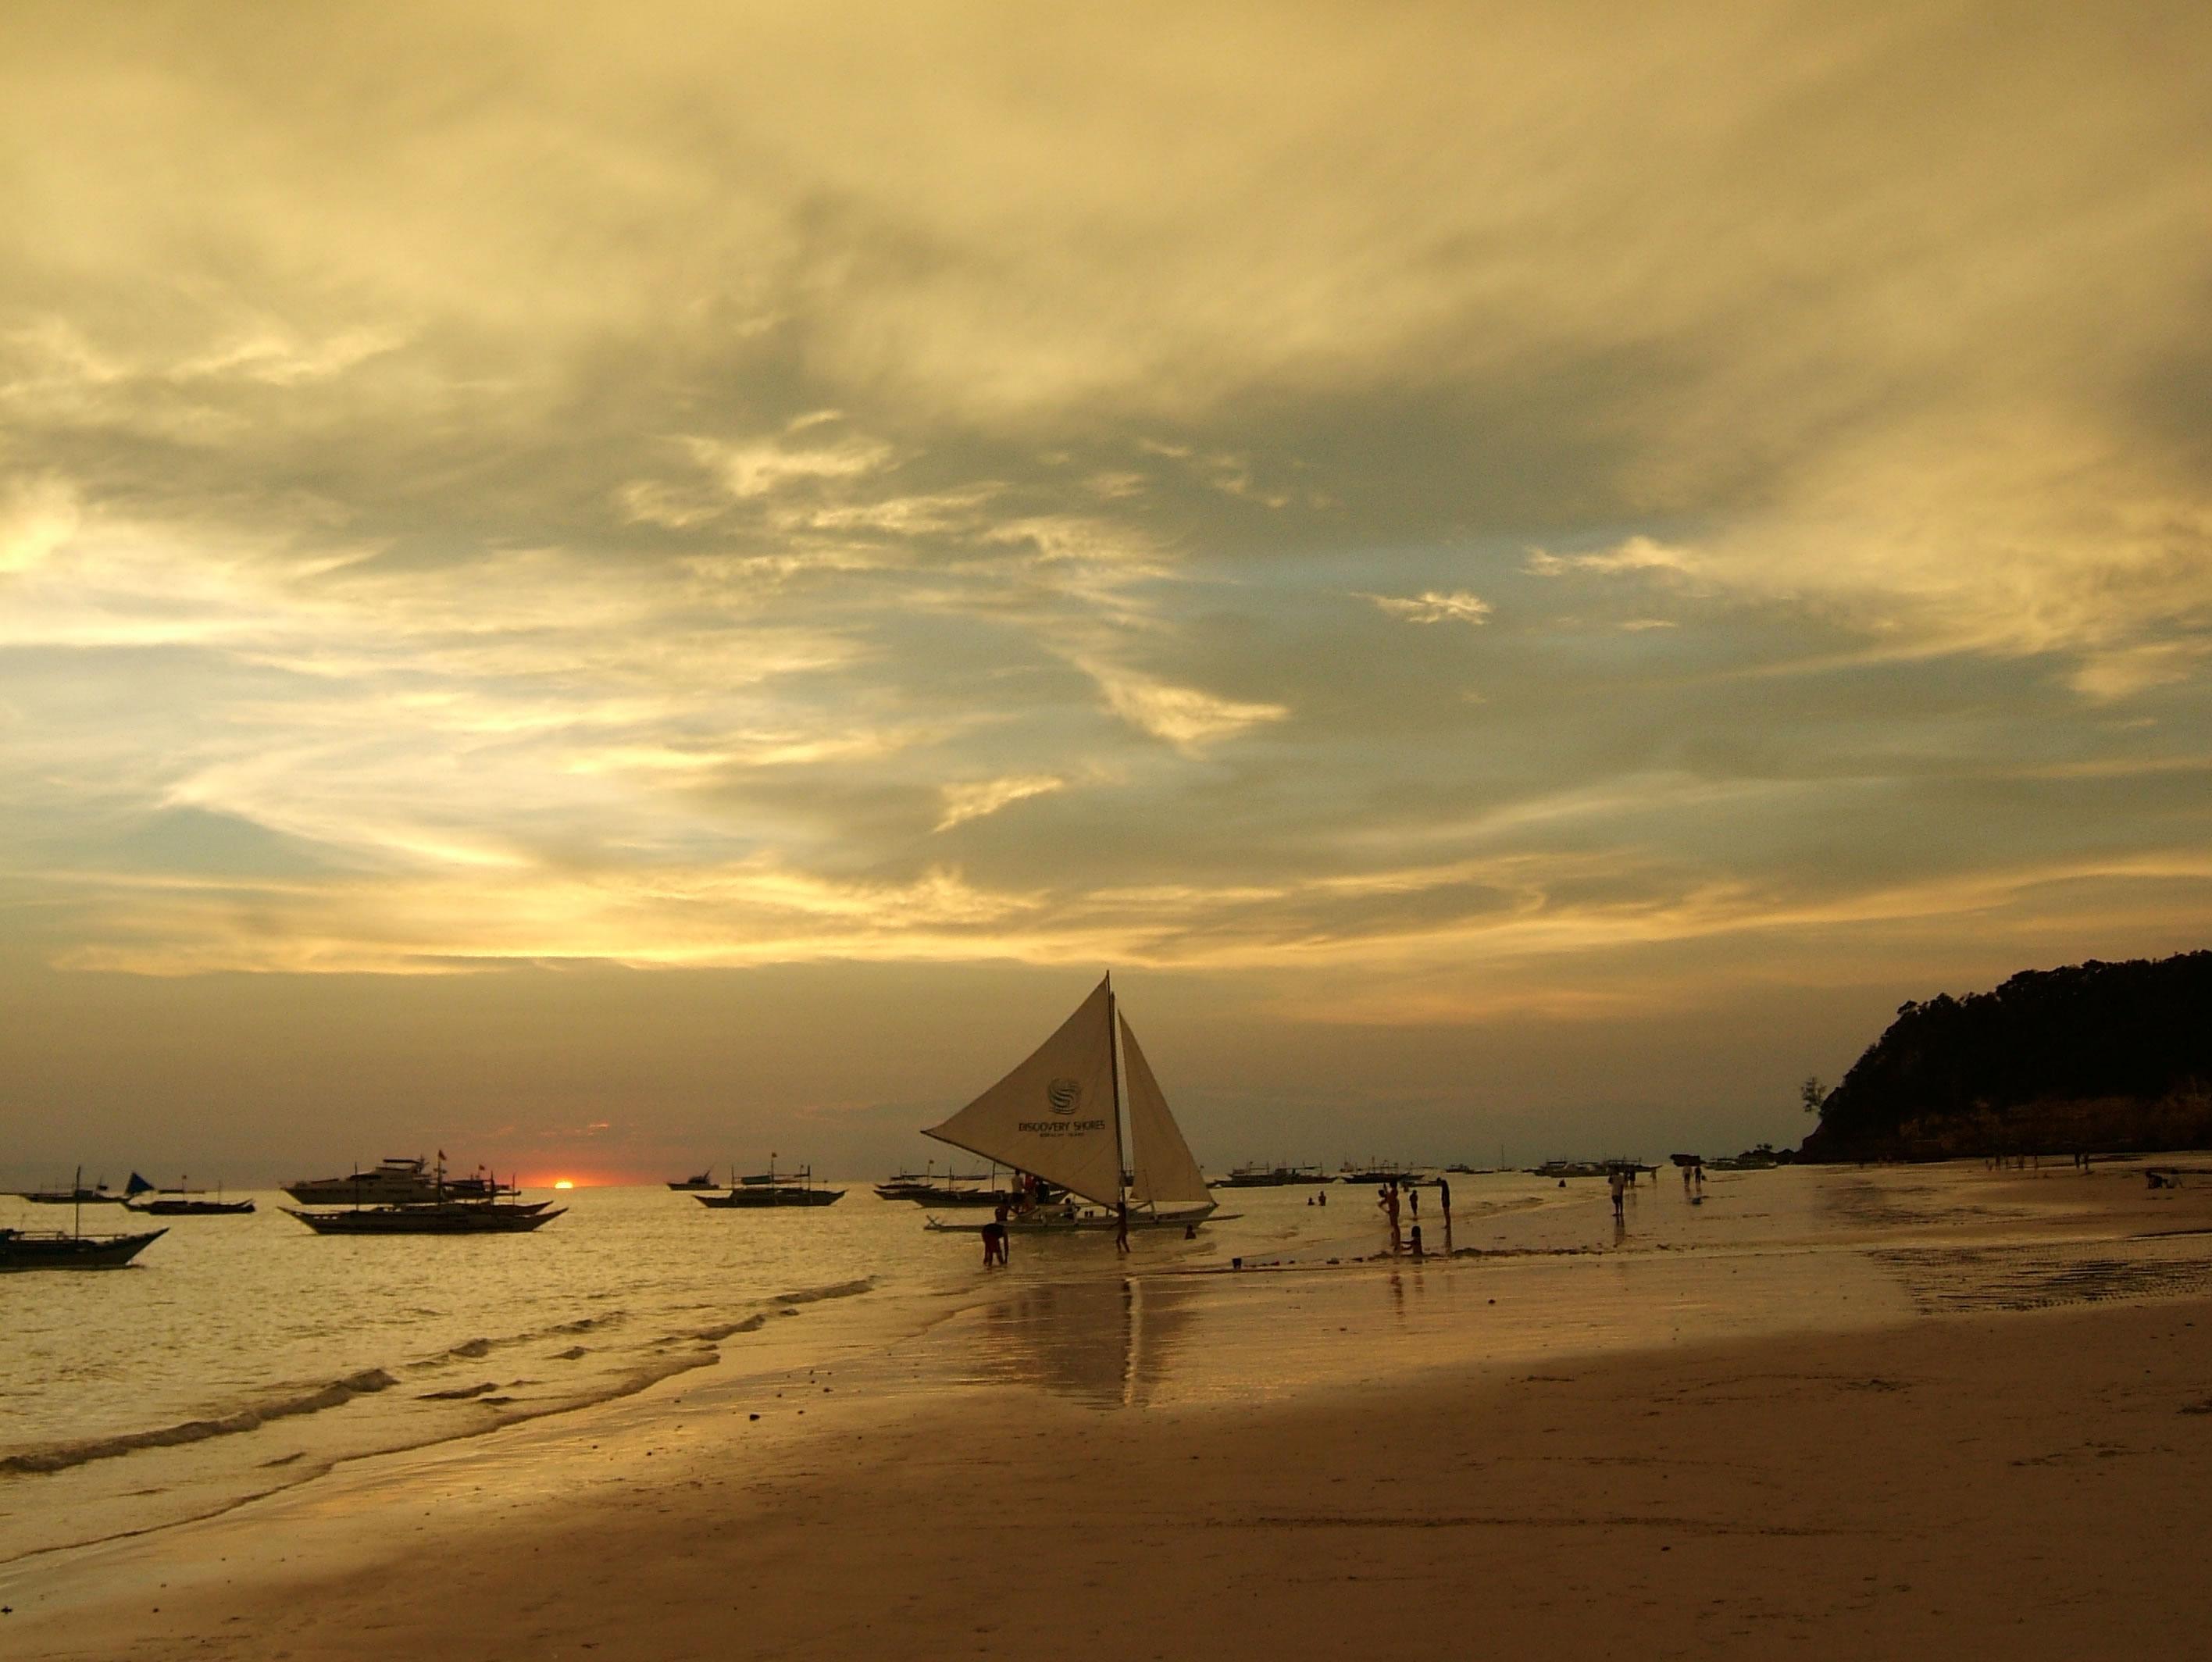 Philippines Sugar Islands Caticlan Boracay White Beach Sunset 2007 28